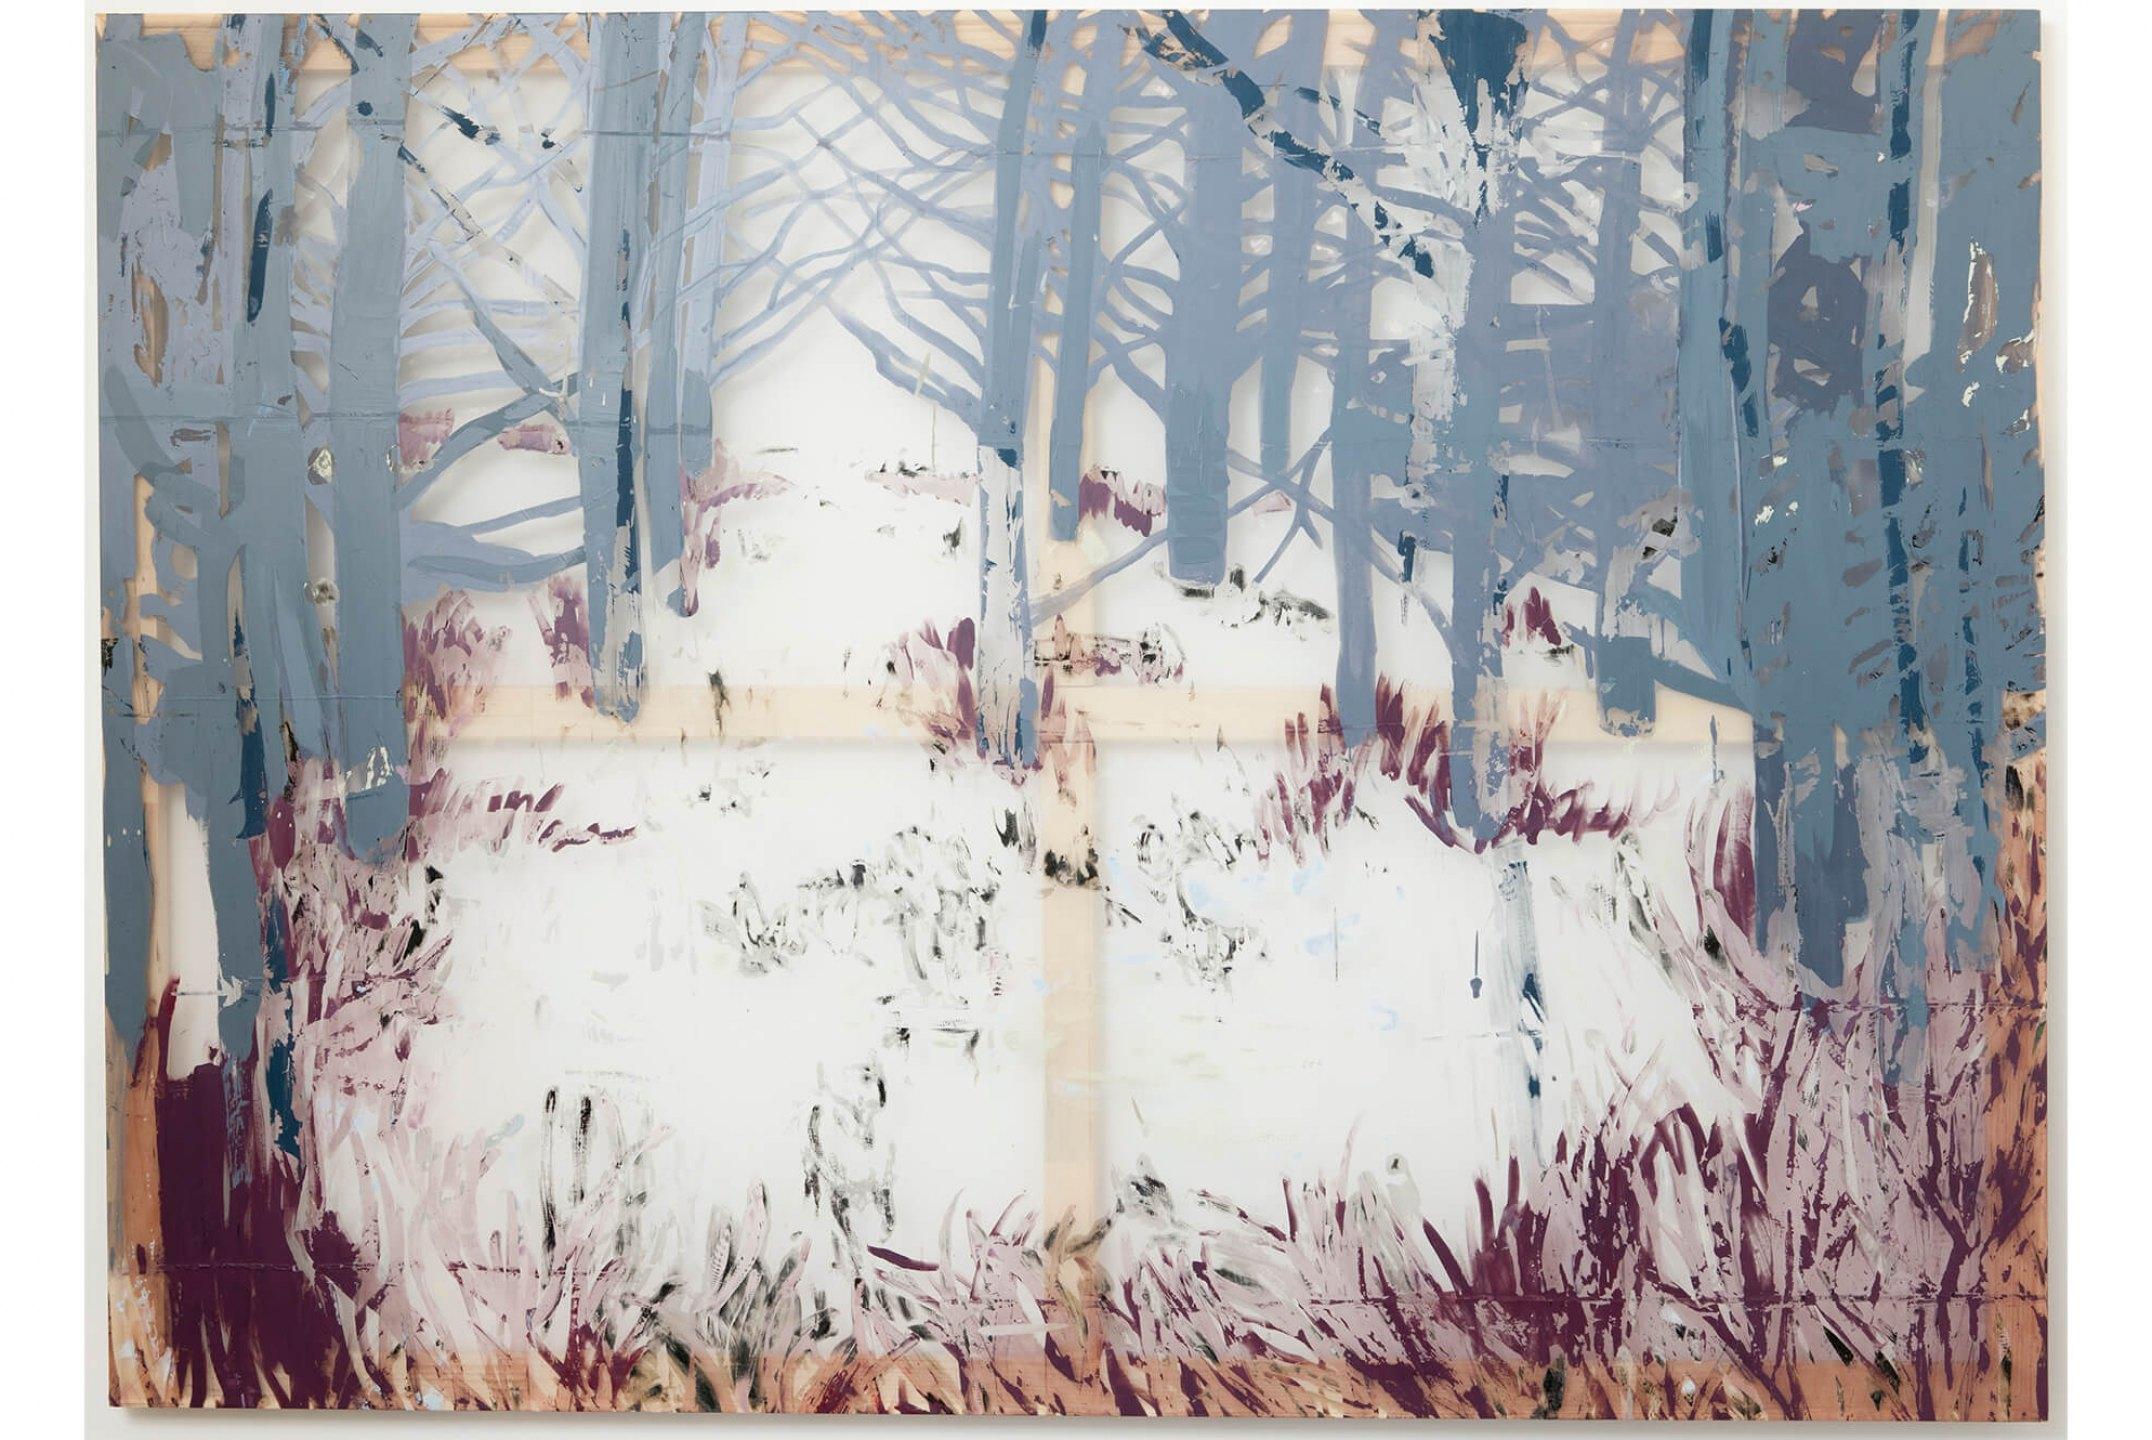 Marina Perez Simão, <em>Untitled</em>, 2012, acrylic on polyester, 51,1× 69,9 inches - Mendes Wood DM